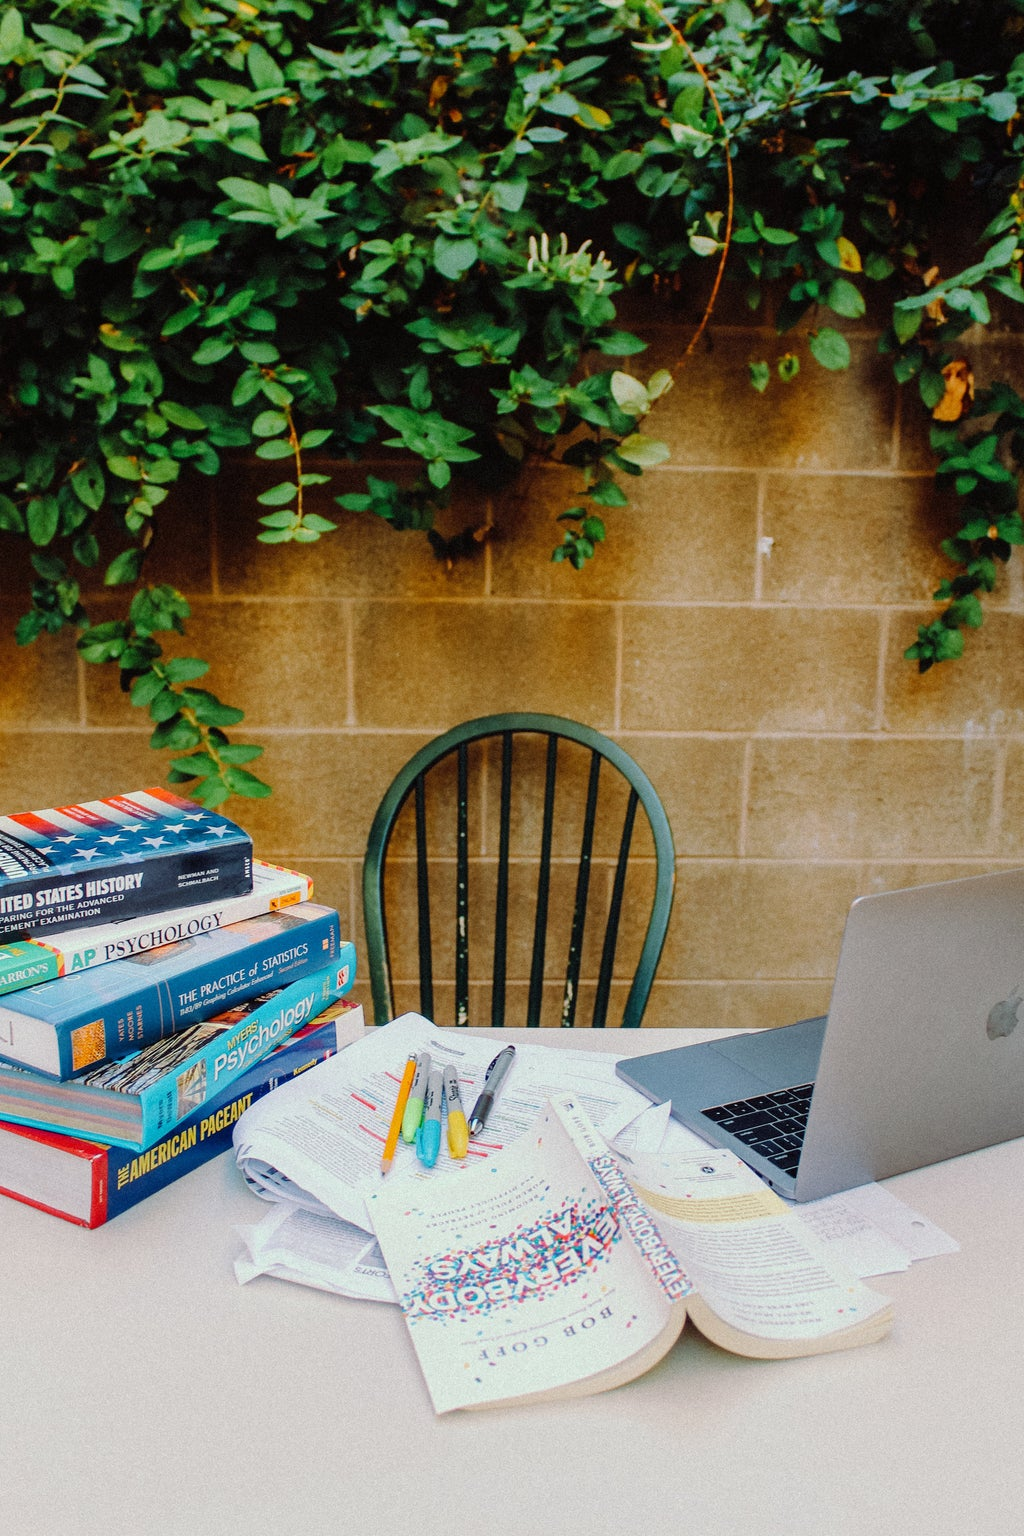 Desk with books